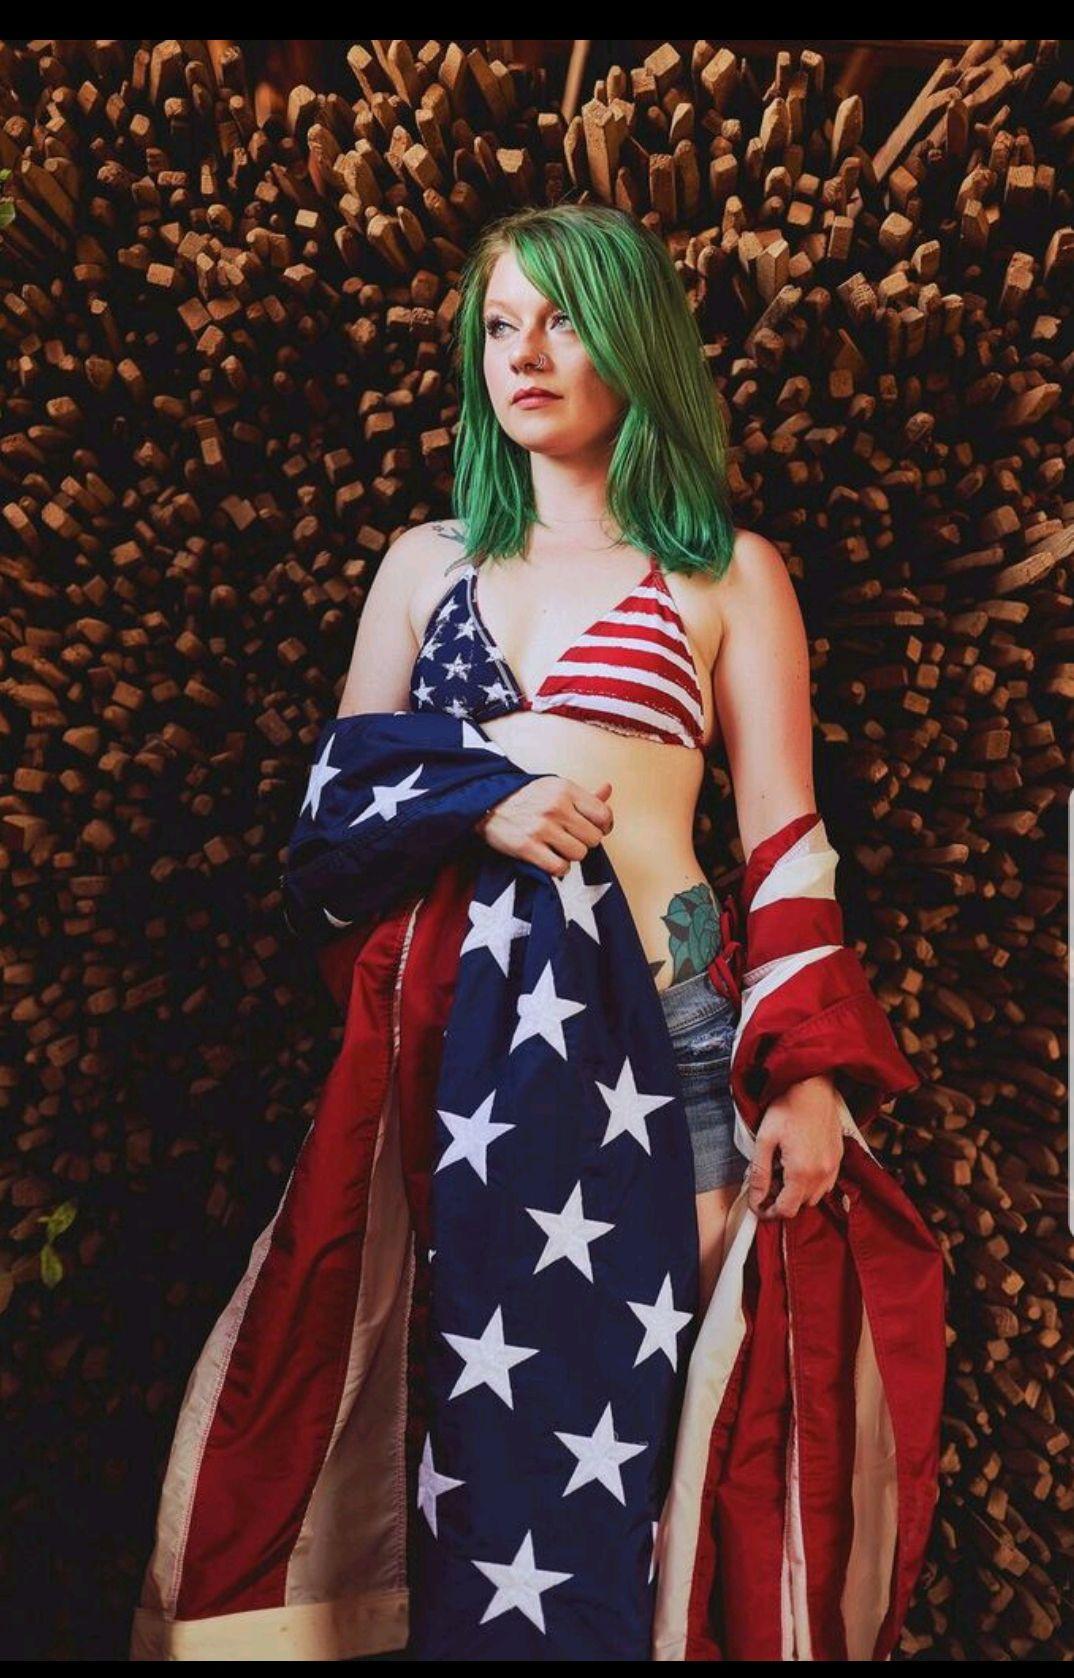 God Bless America 2.0 Photographer Tate Chmielewski